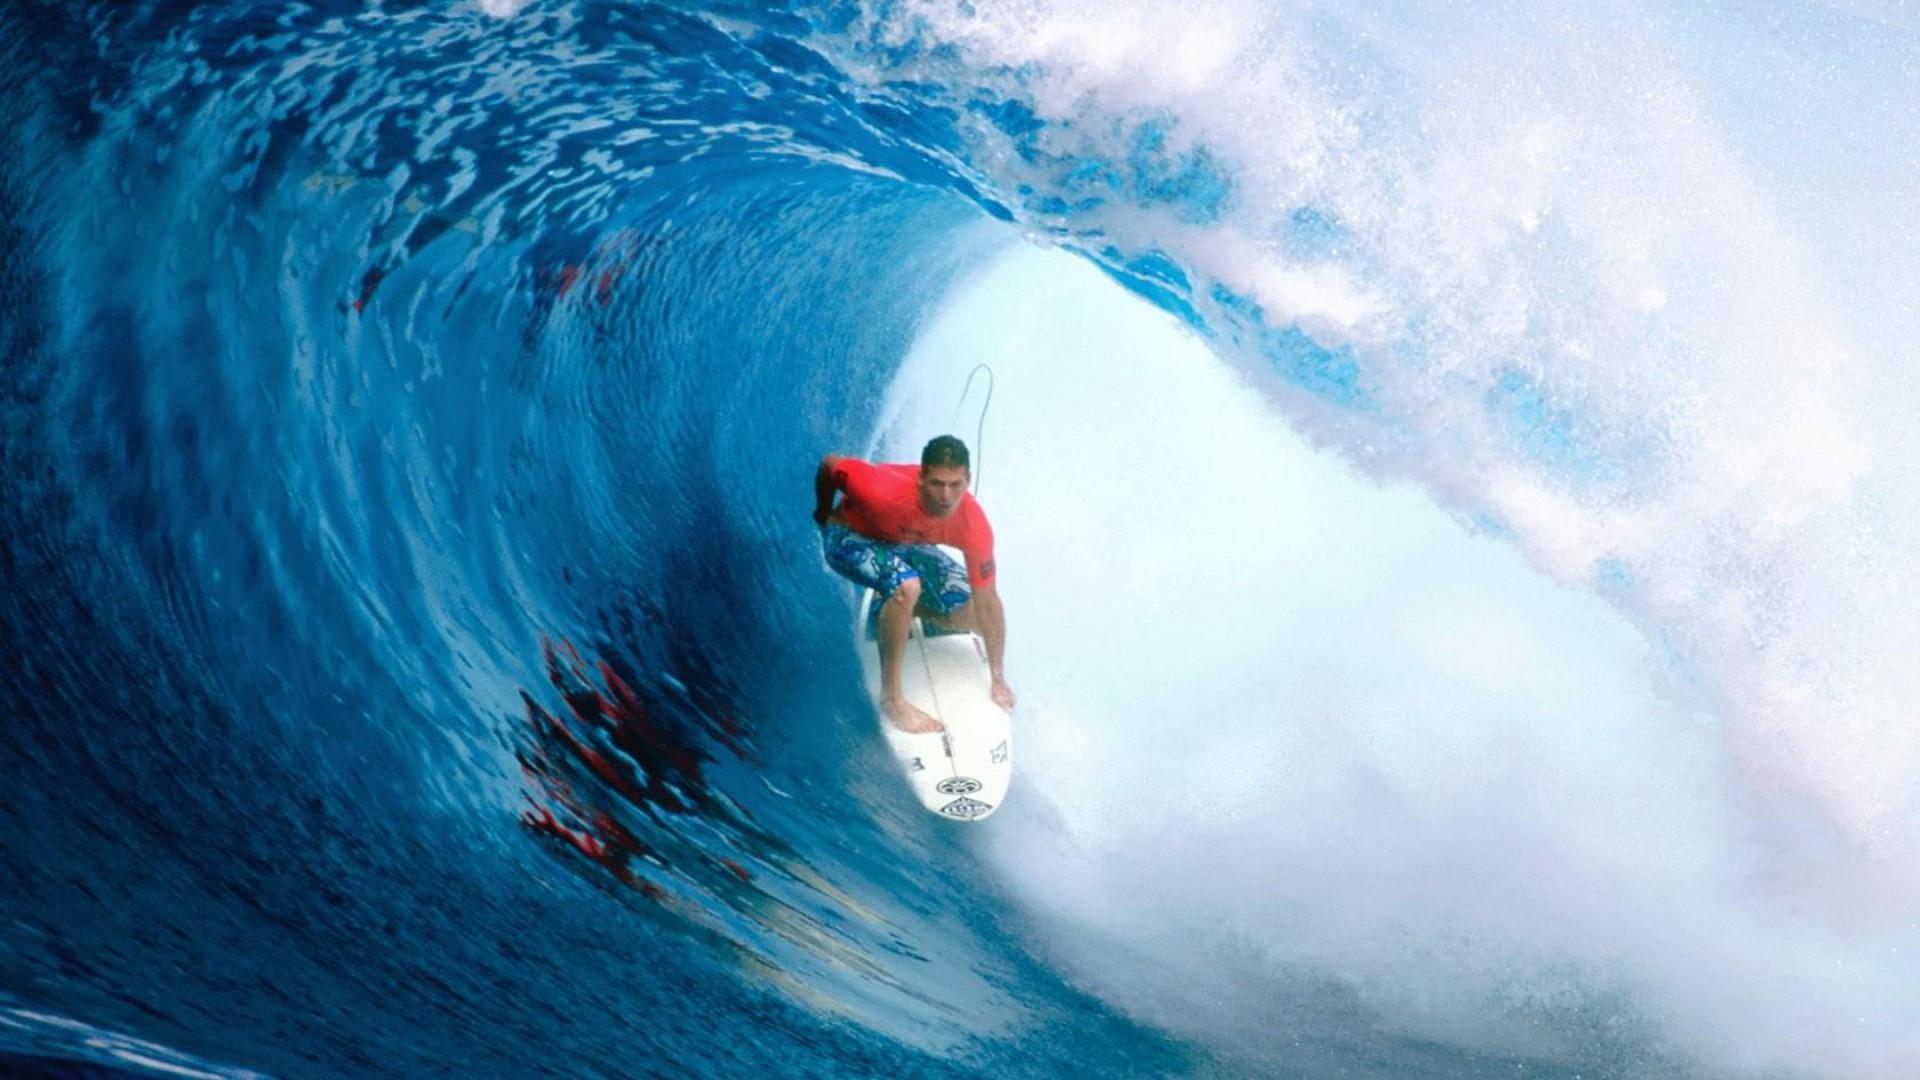 Surfing Wallpaper Surfing Wallpaper 1920×1080